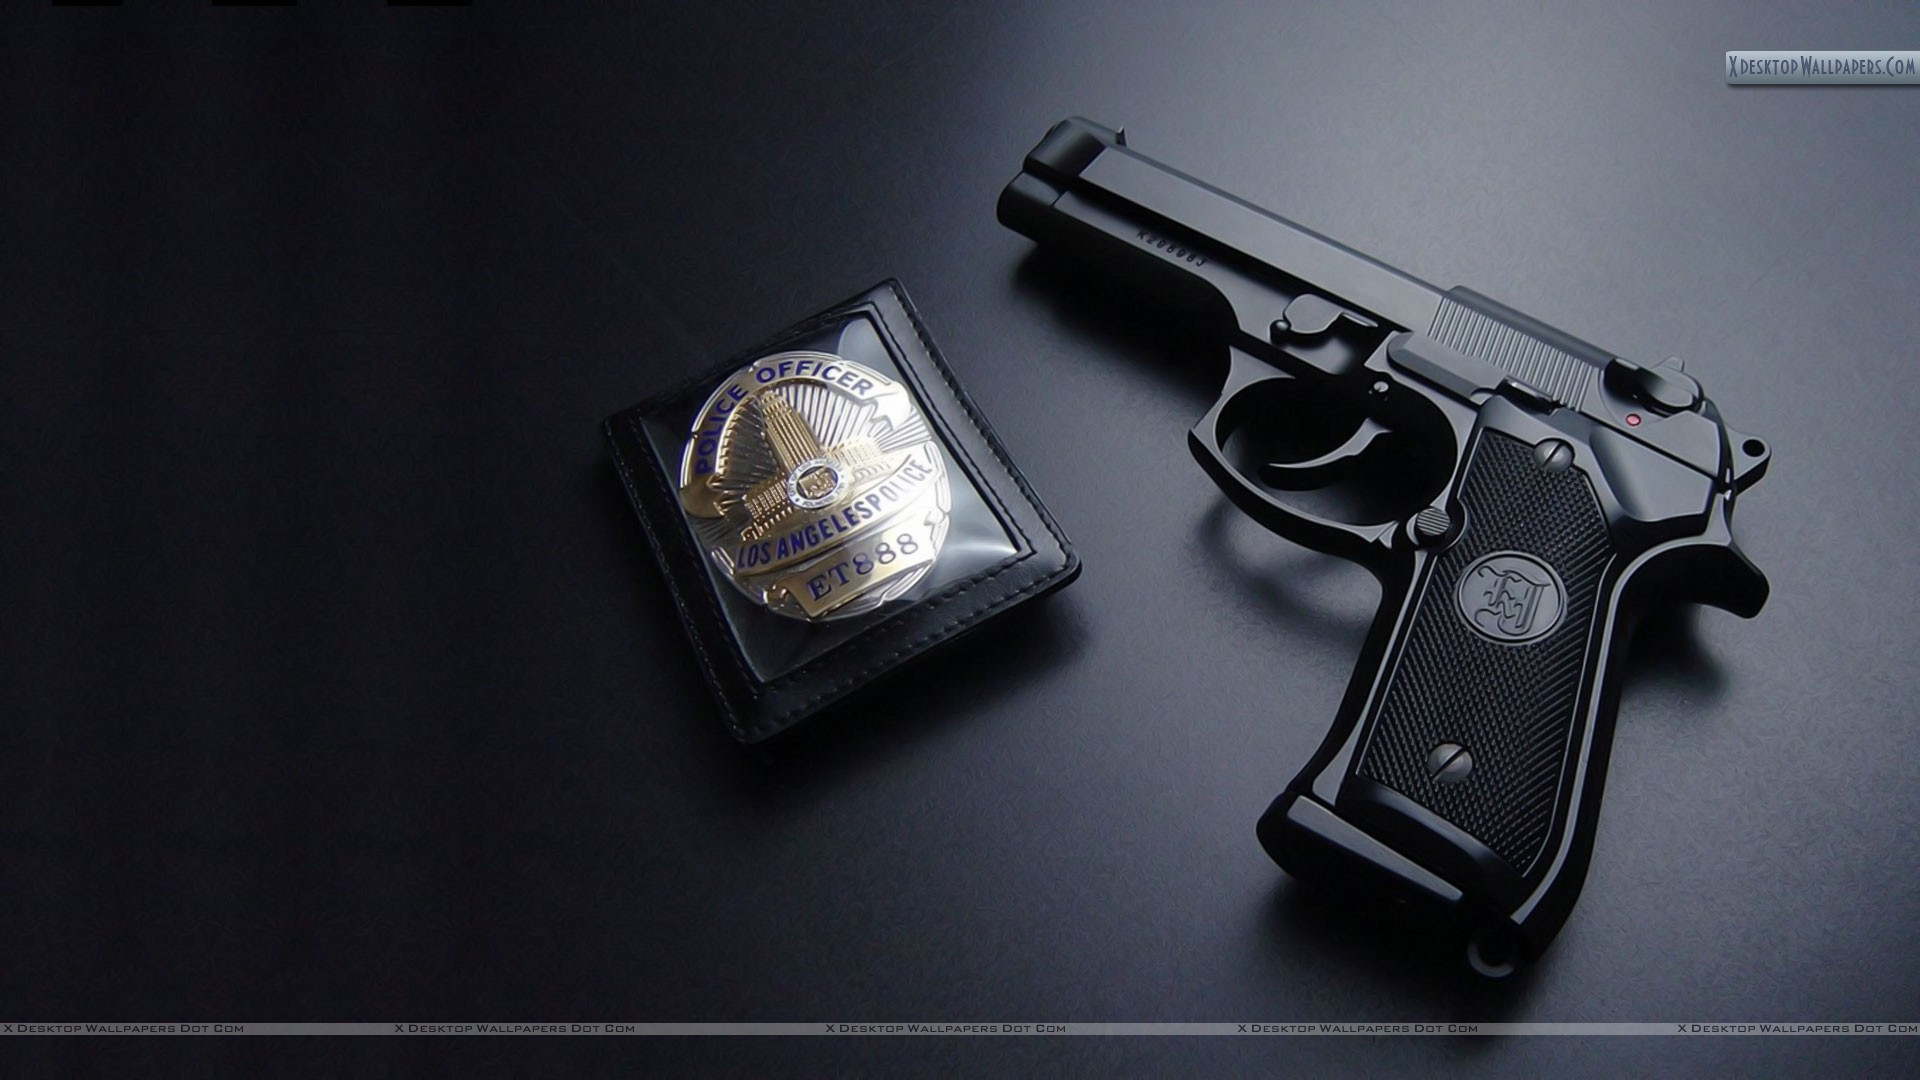 Police SWAT Wallpaper | HD Wallpapers | Pinterest | Hd wallpaper and  Wallpaper